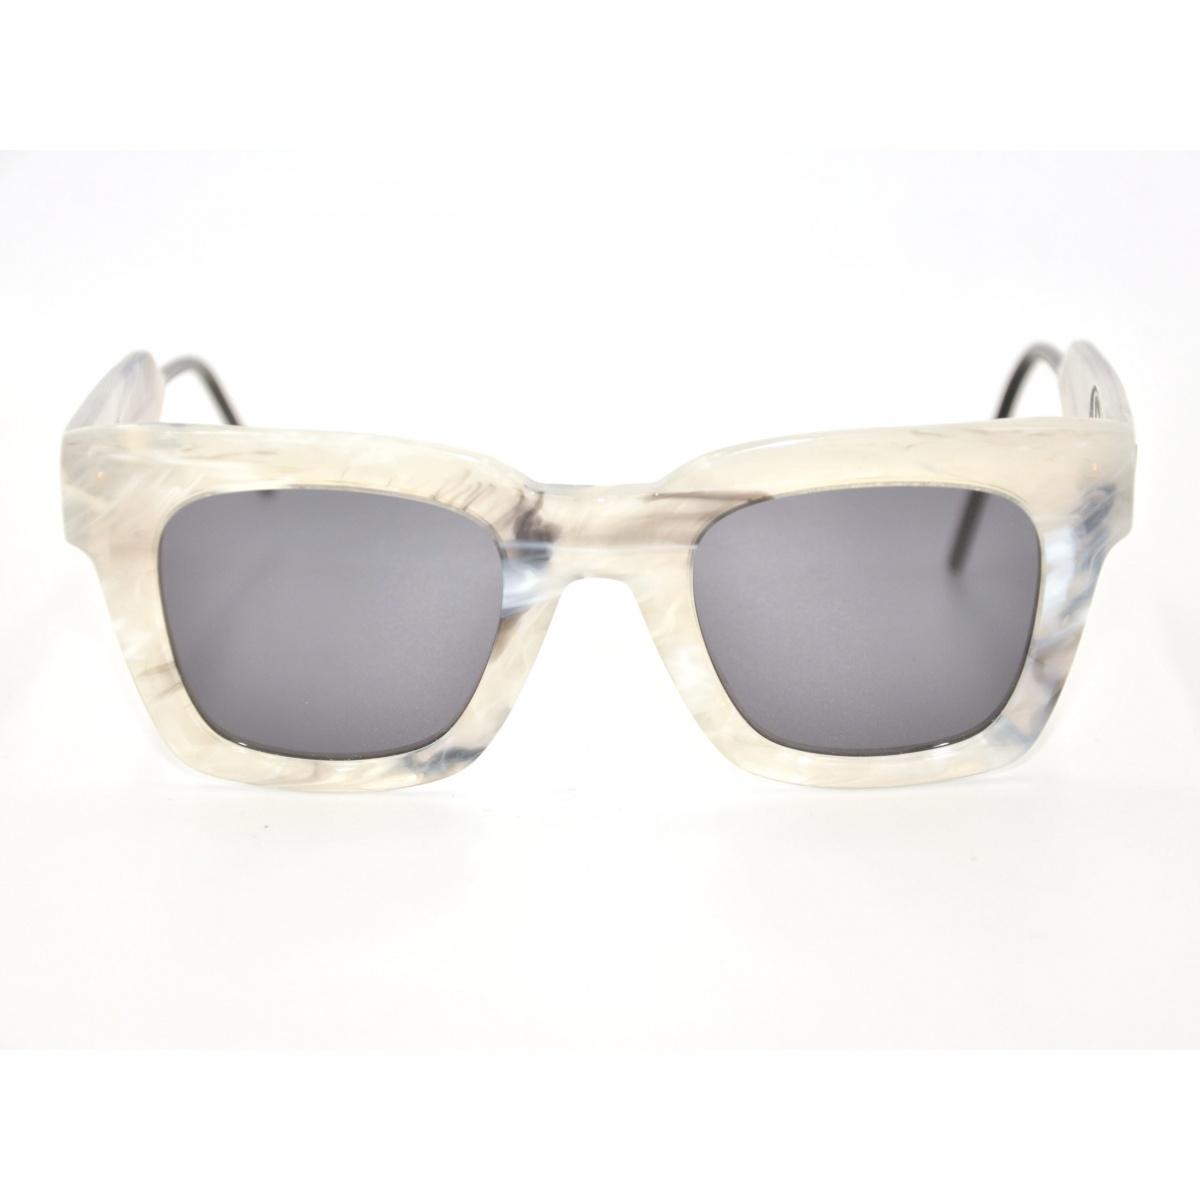 SOYA ALEXANDER CRW UNISEX Sunglasses 2018